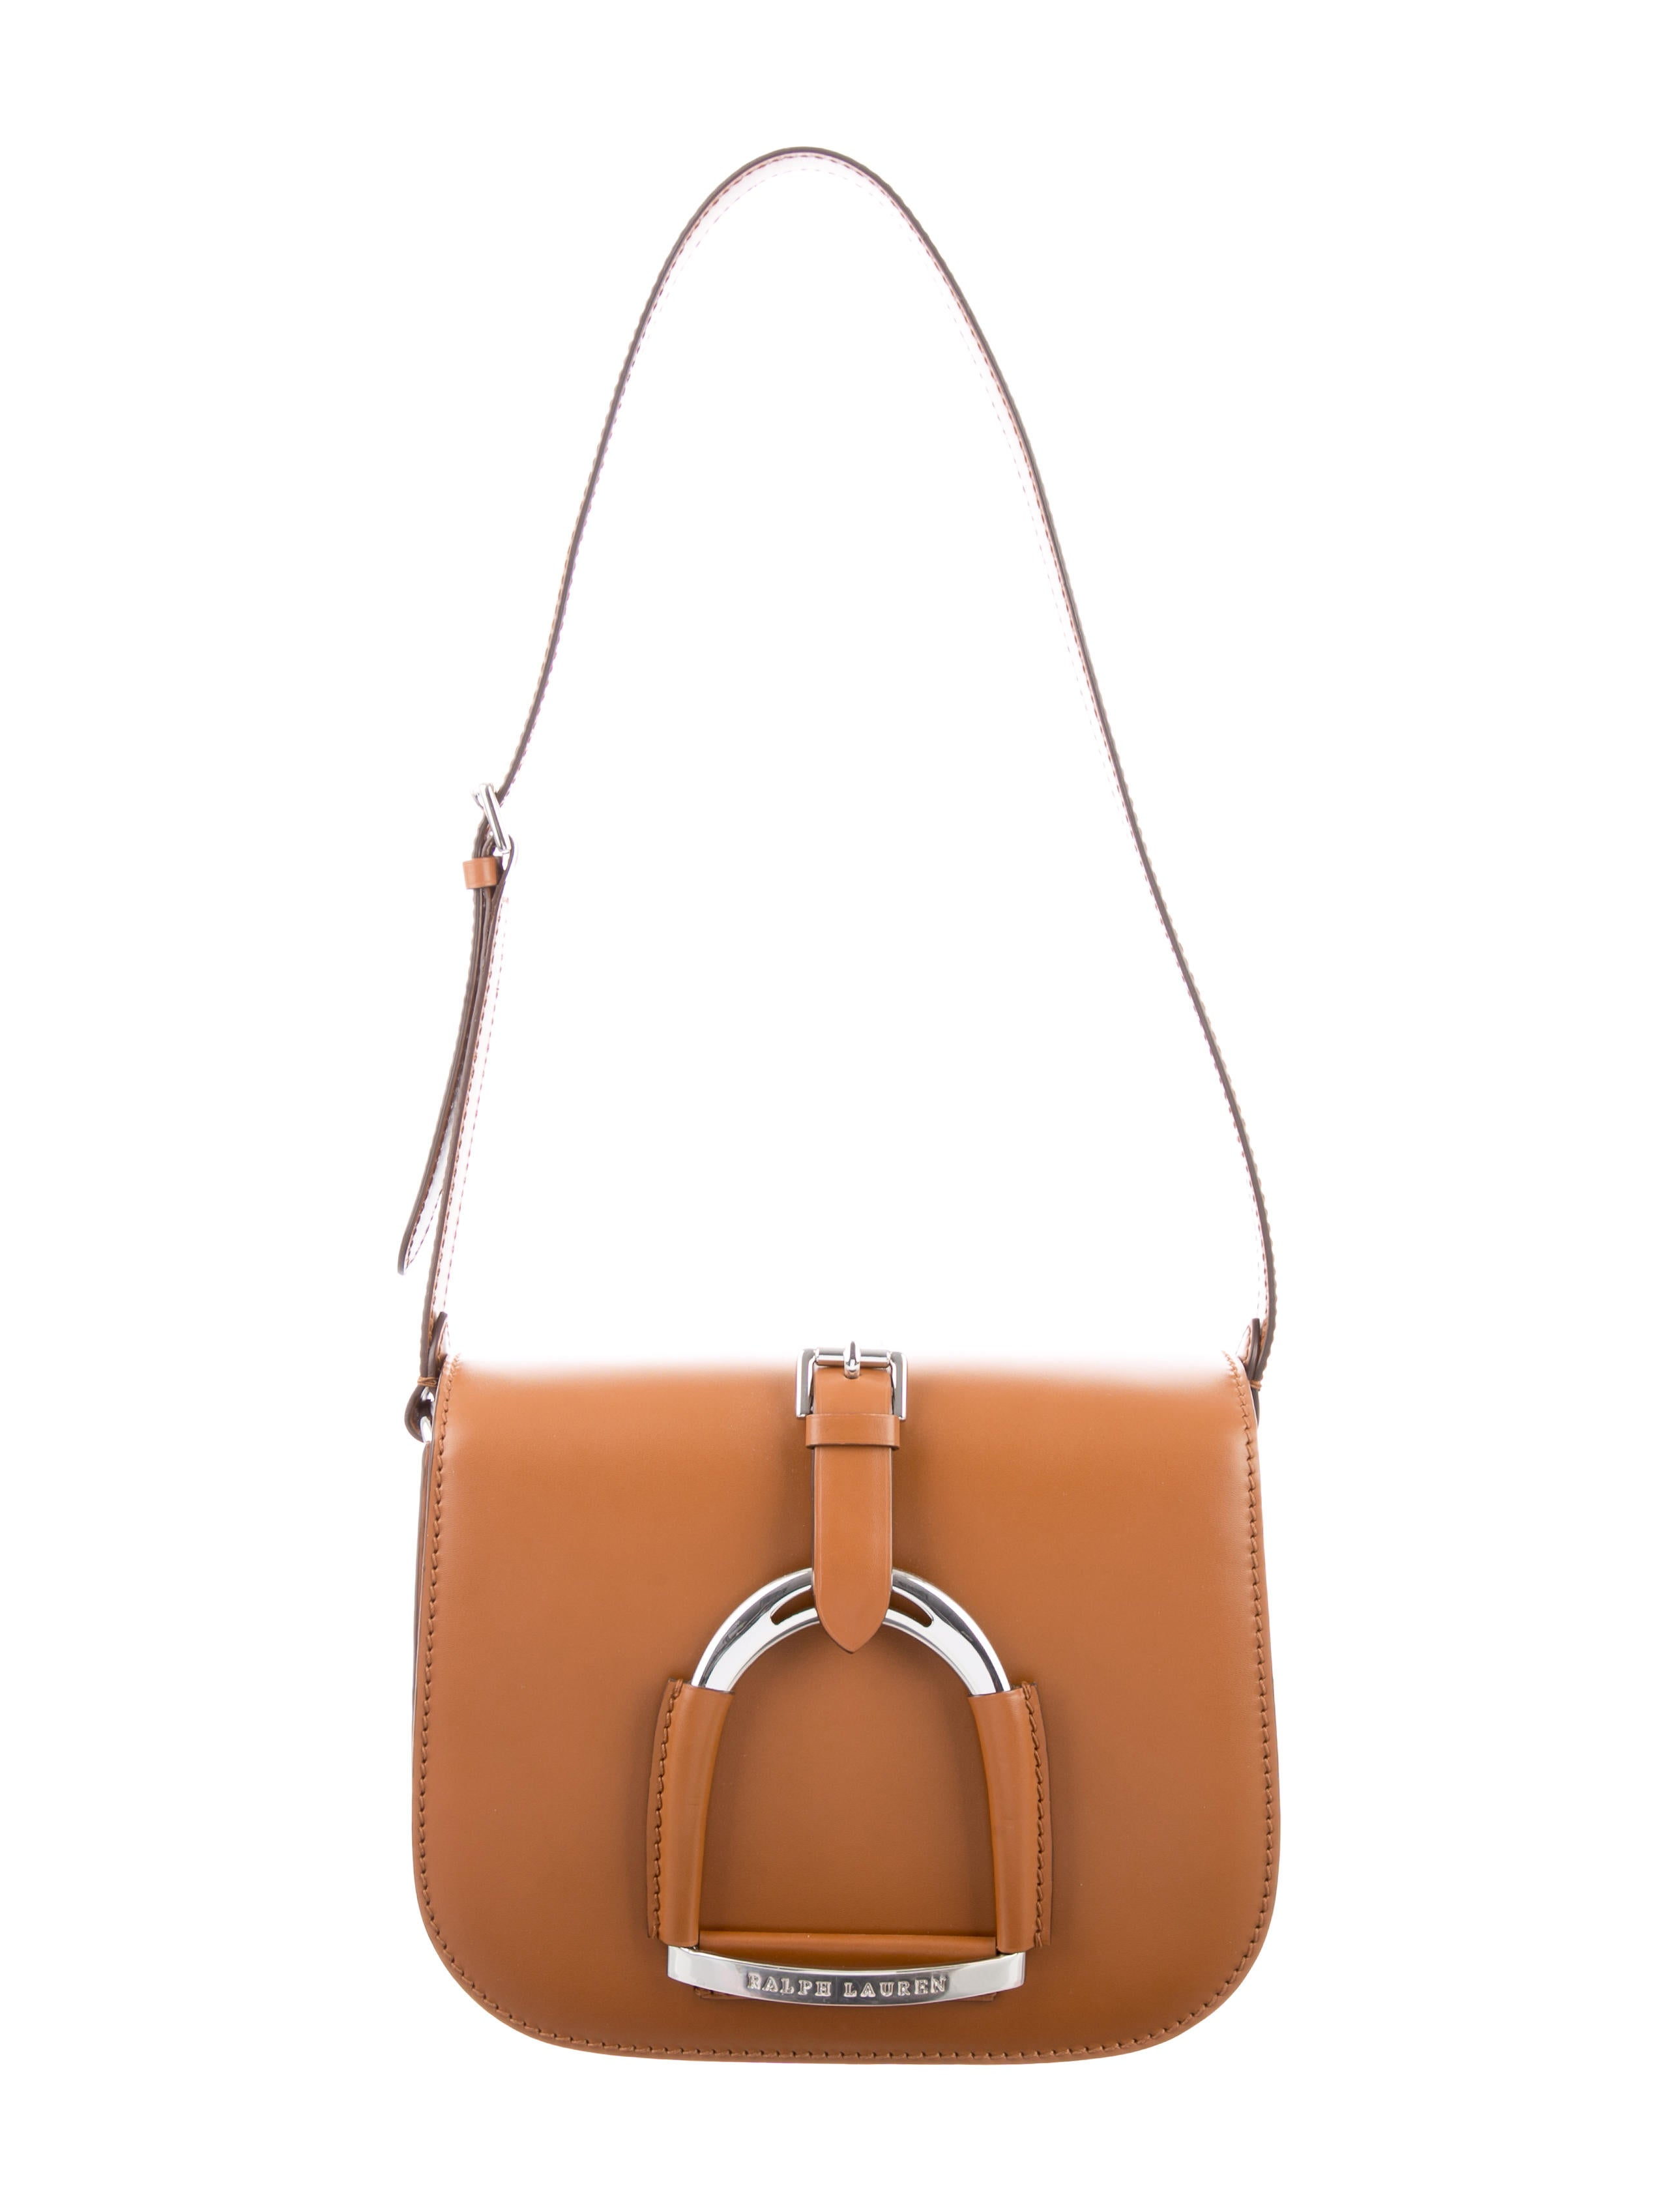 54d798d7c6 ... inexpensive ralph lauren horsebit embellished saddle bag w tags handbags  wyg26069 the realreal bfba8 773f2